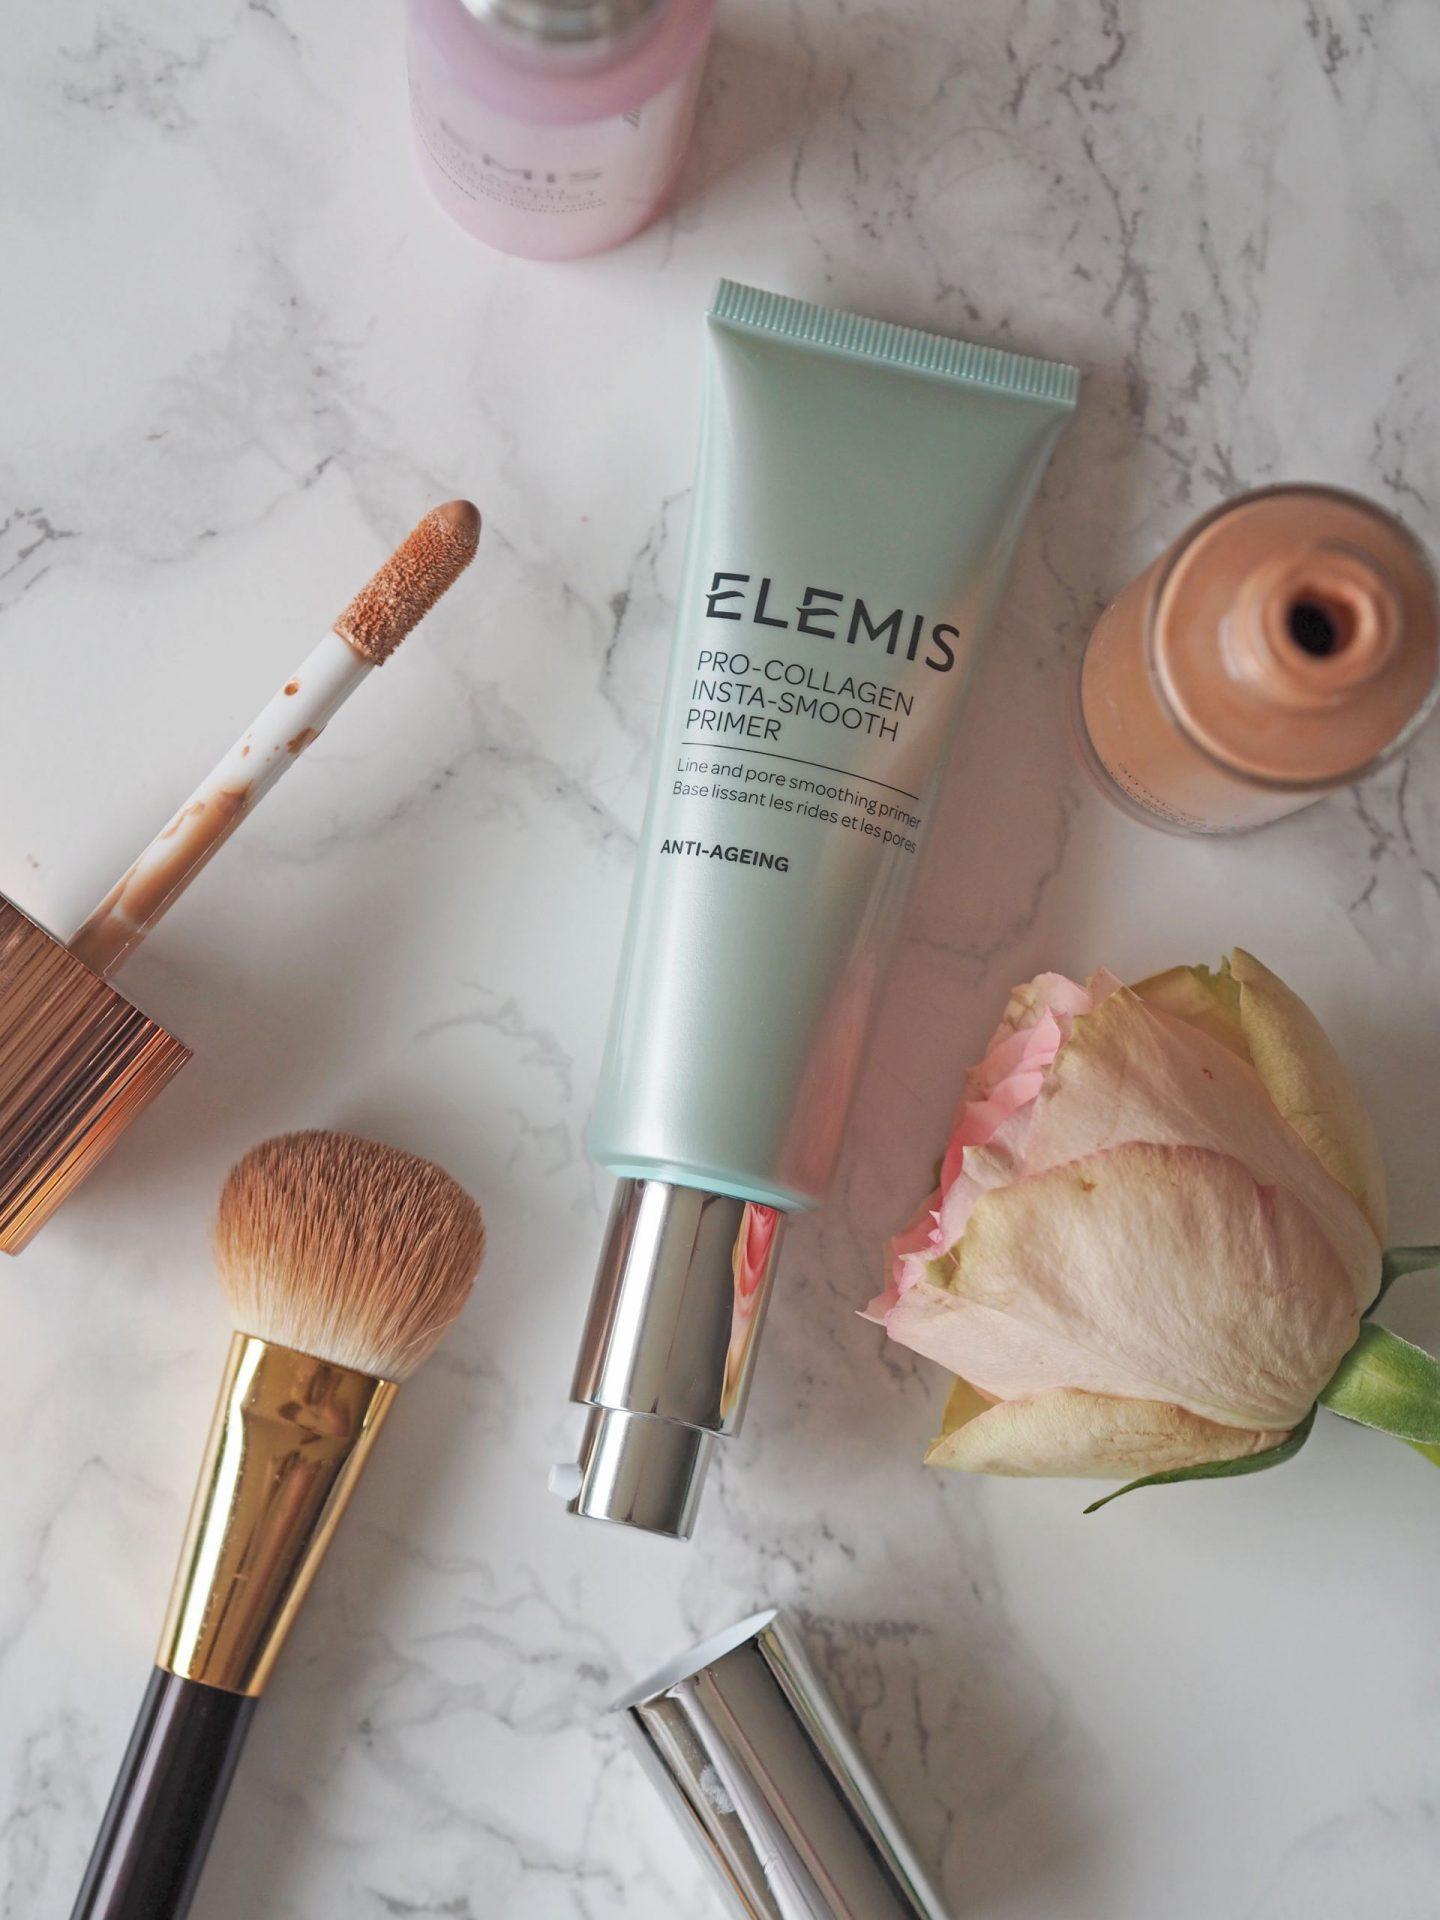 elemis pro-collagen insta-smooth primer